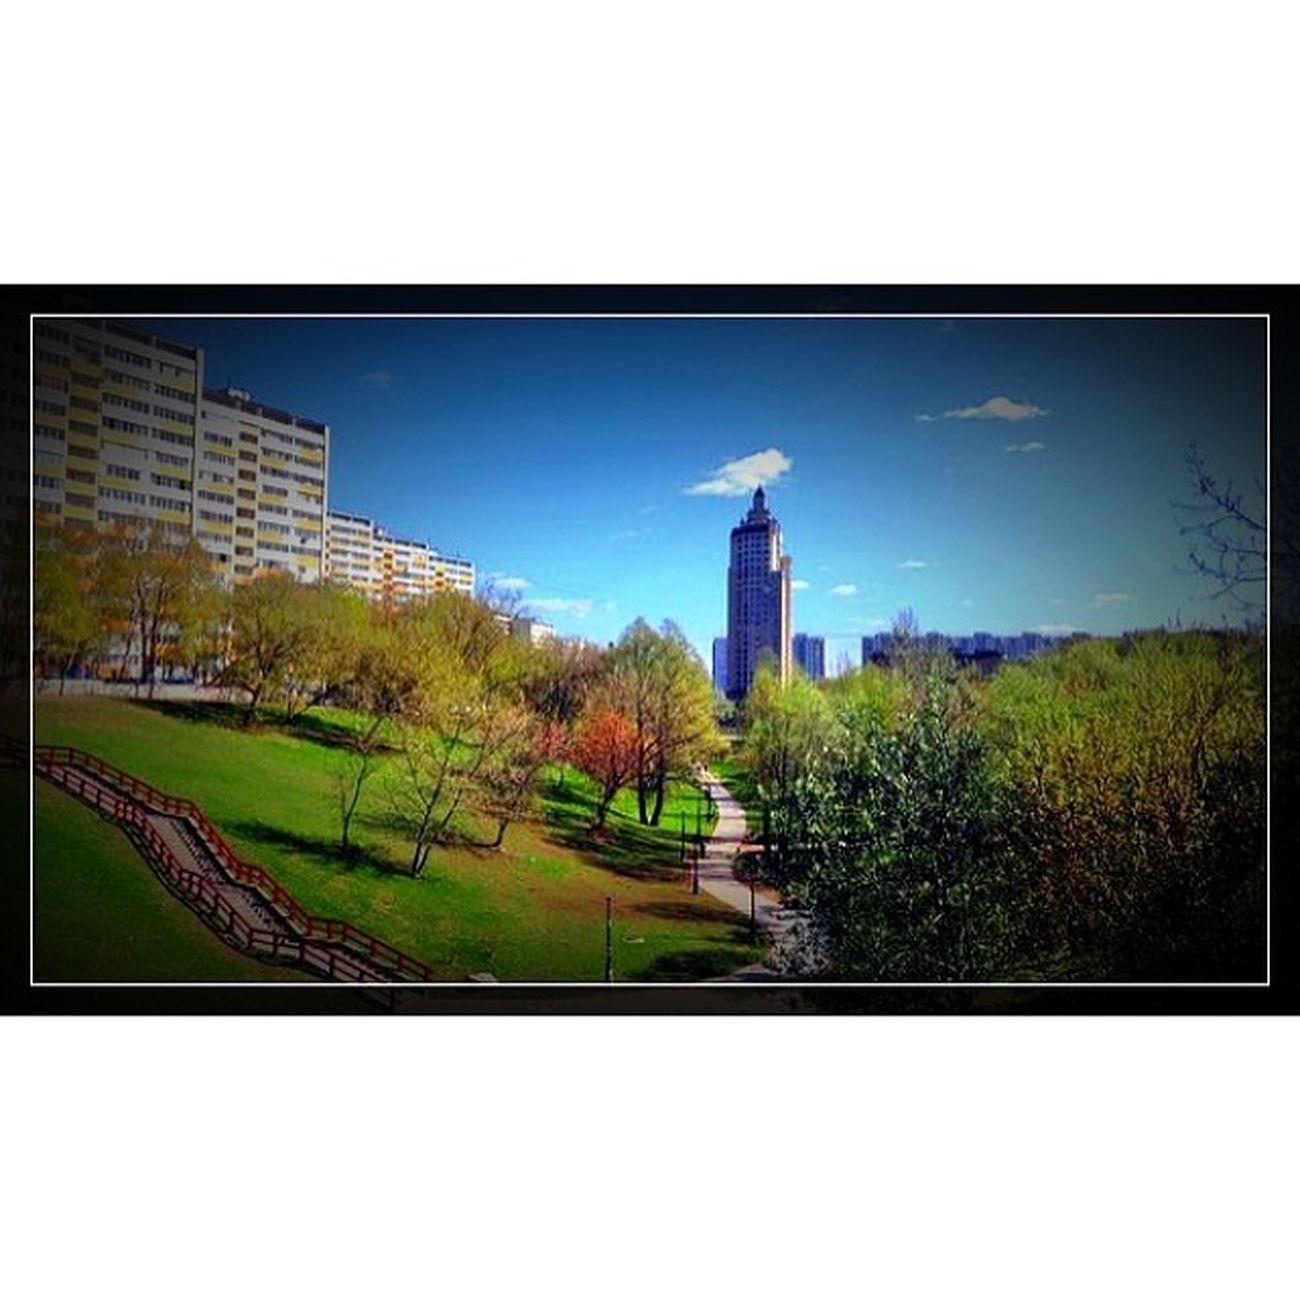 @fotor_apps Fotor мойдом Москва дом весна вечерсвершининым myhome moscow instamoscow spring